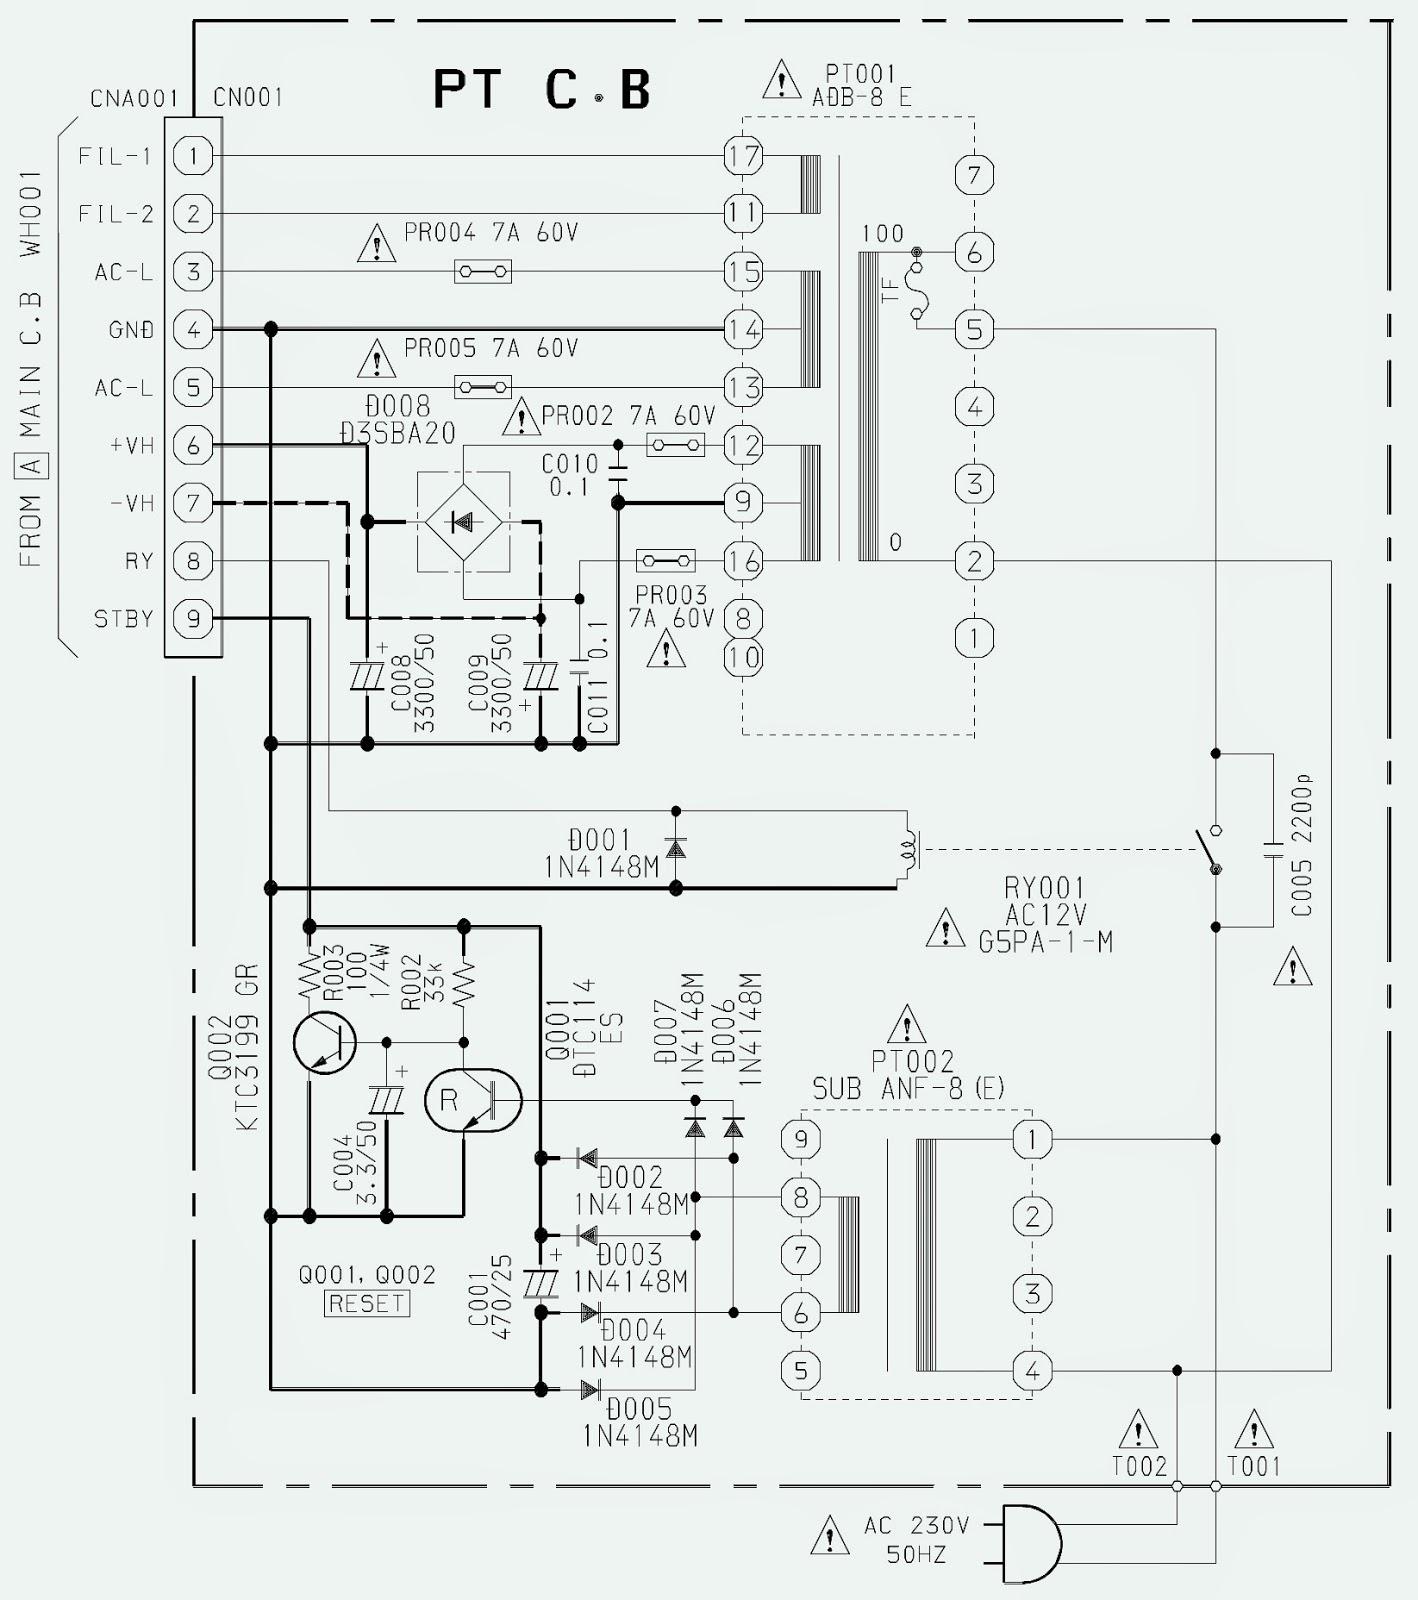 sony aiwa f2100 tv circuit diagram